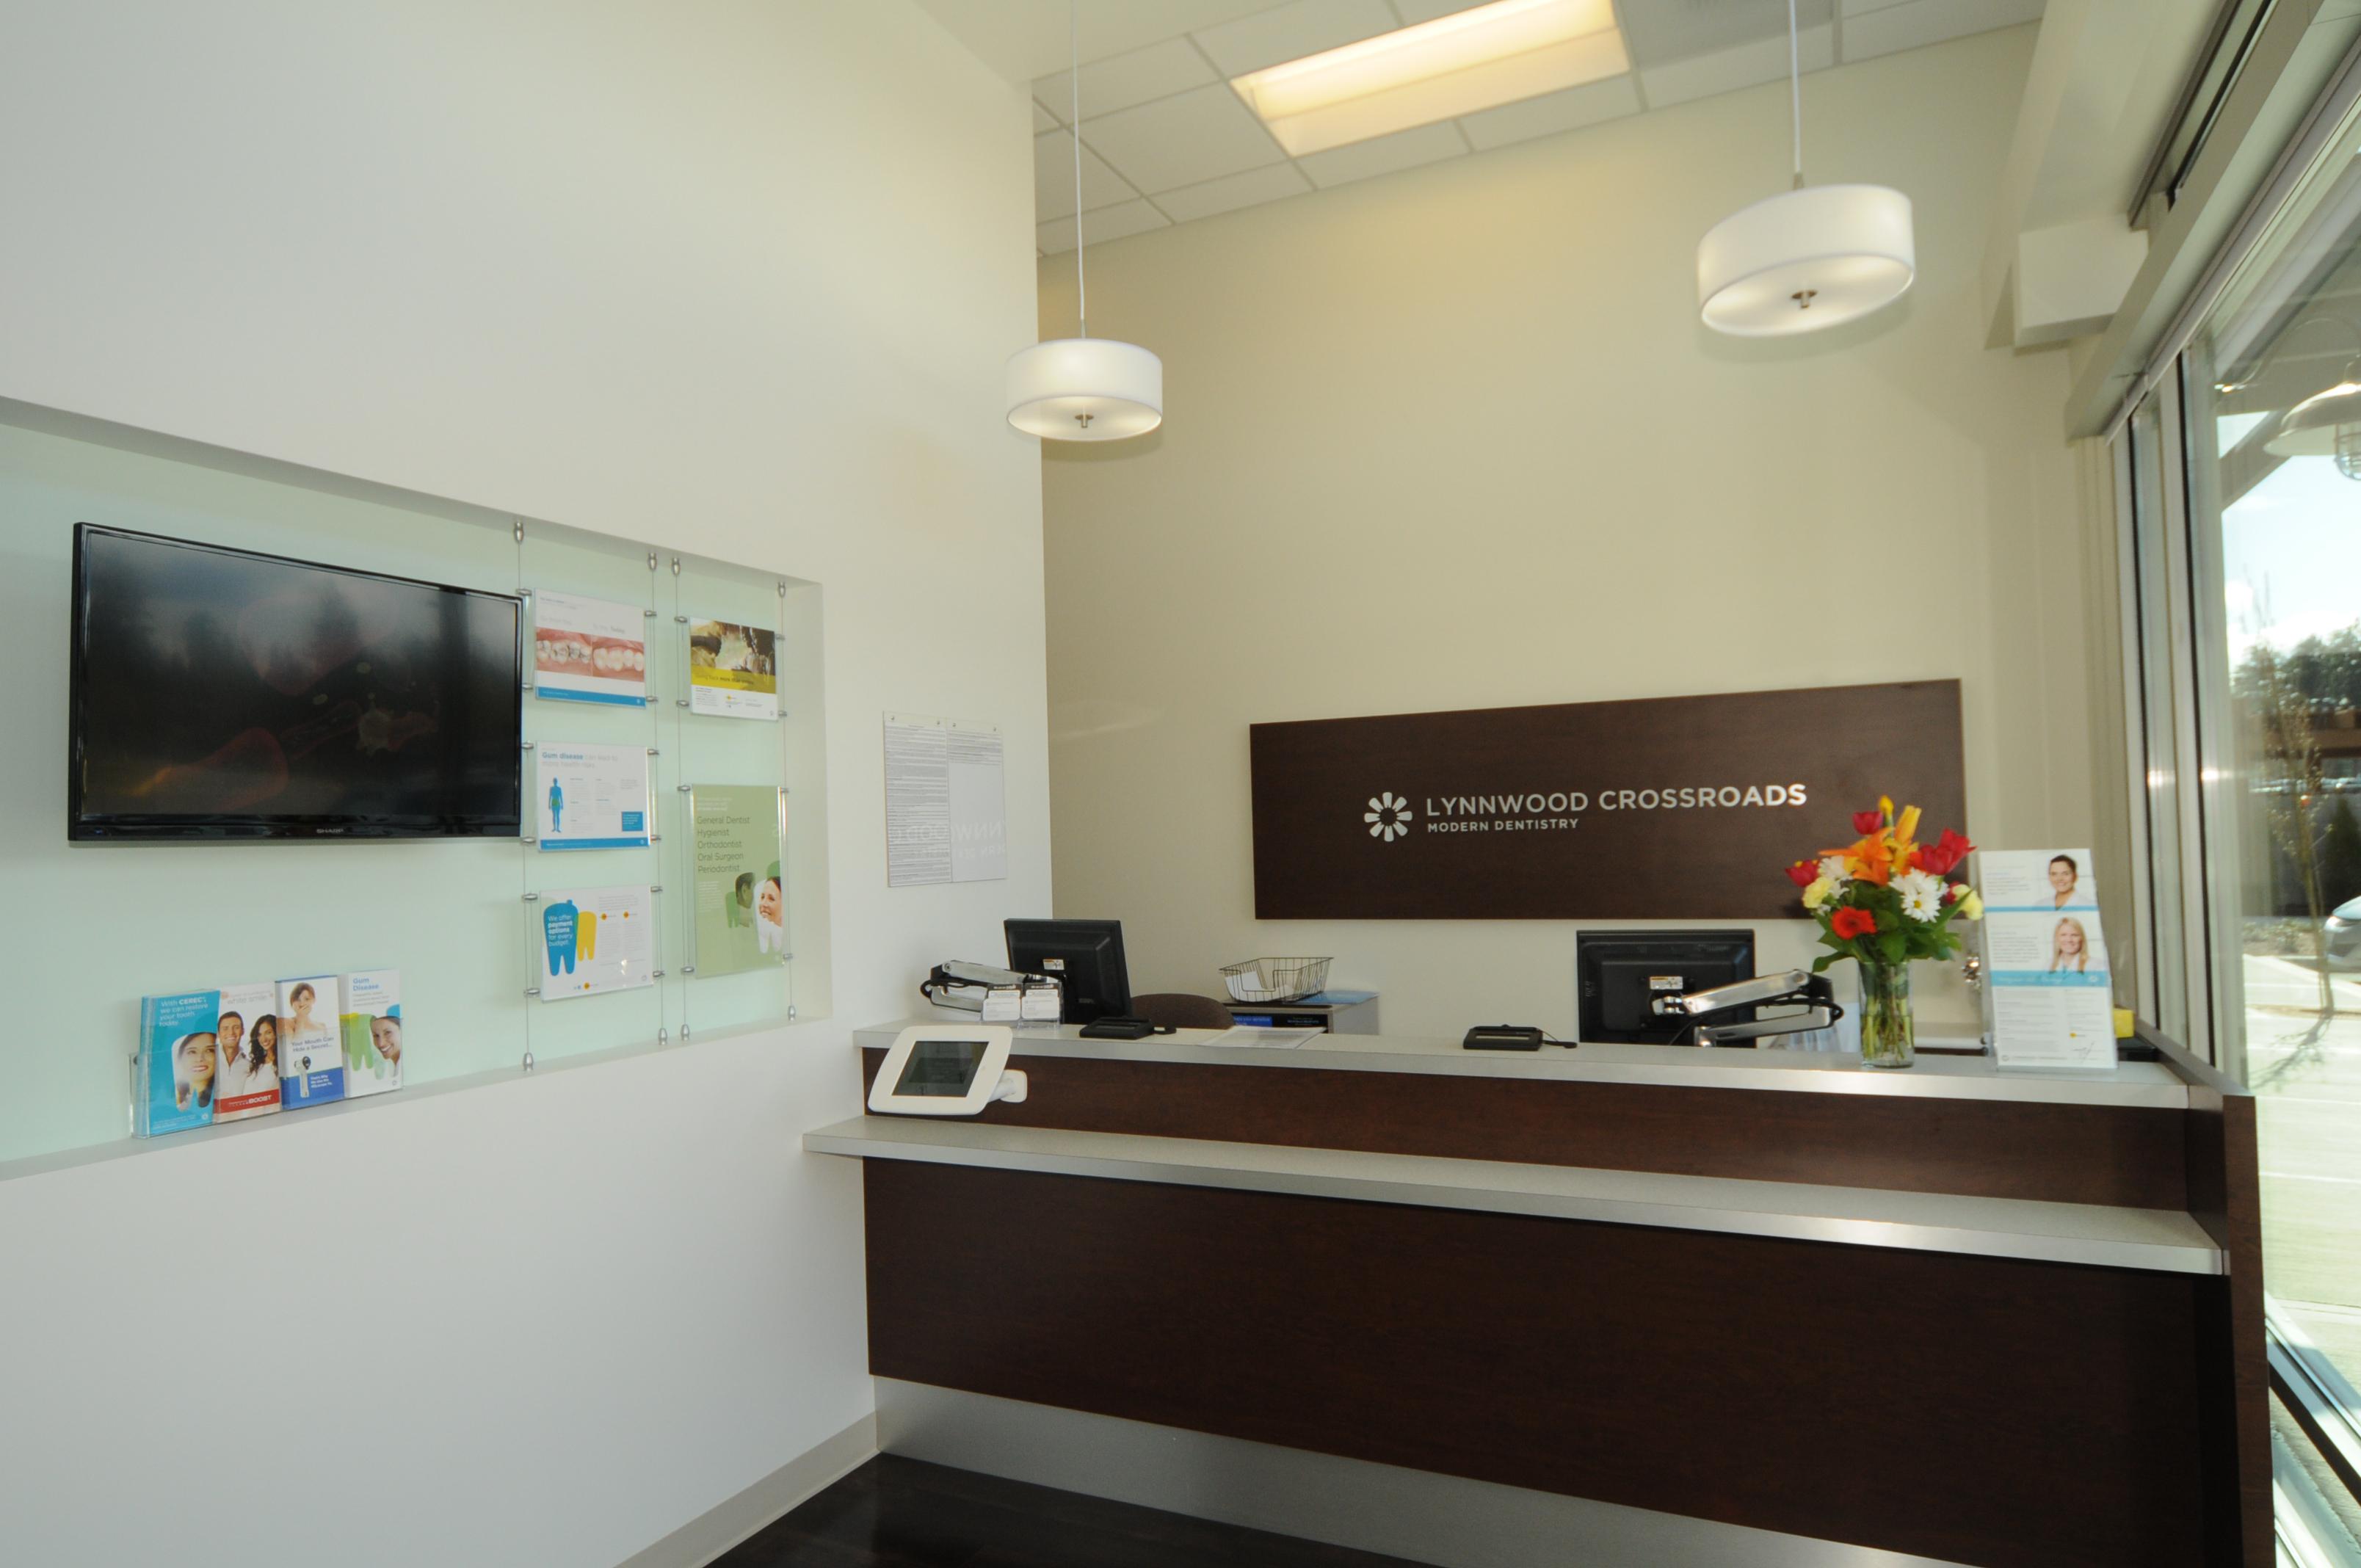 Lynnwood Crossroads Modern Dentistry and Orthodontics image 1